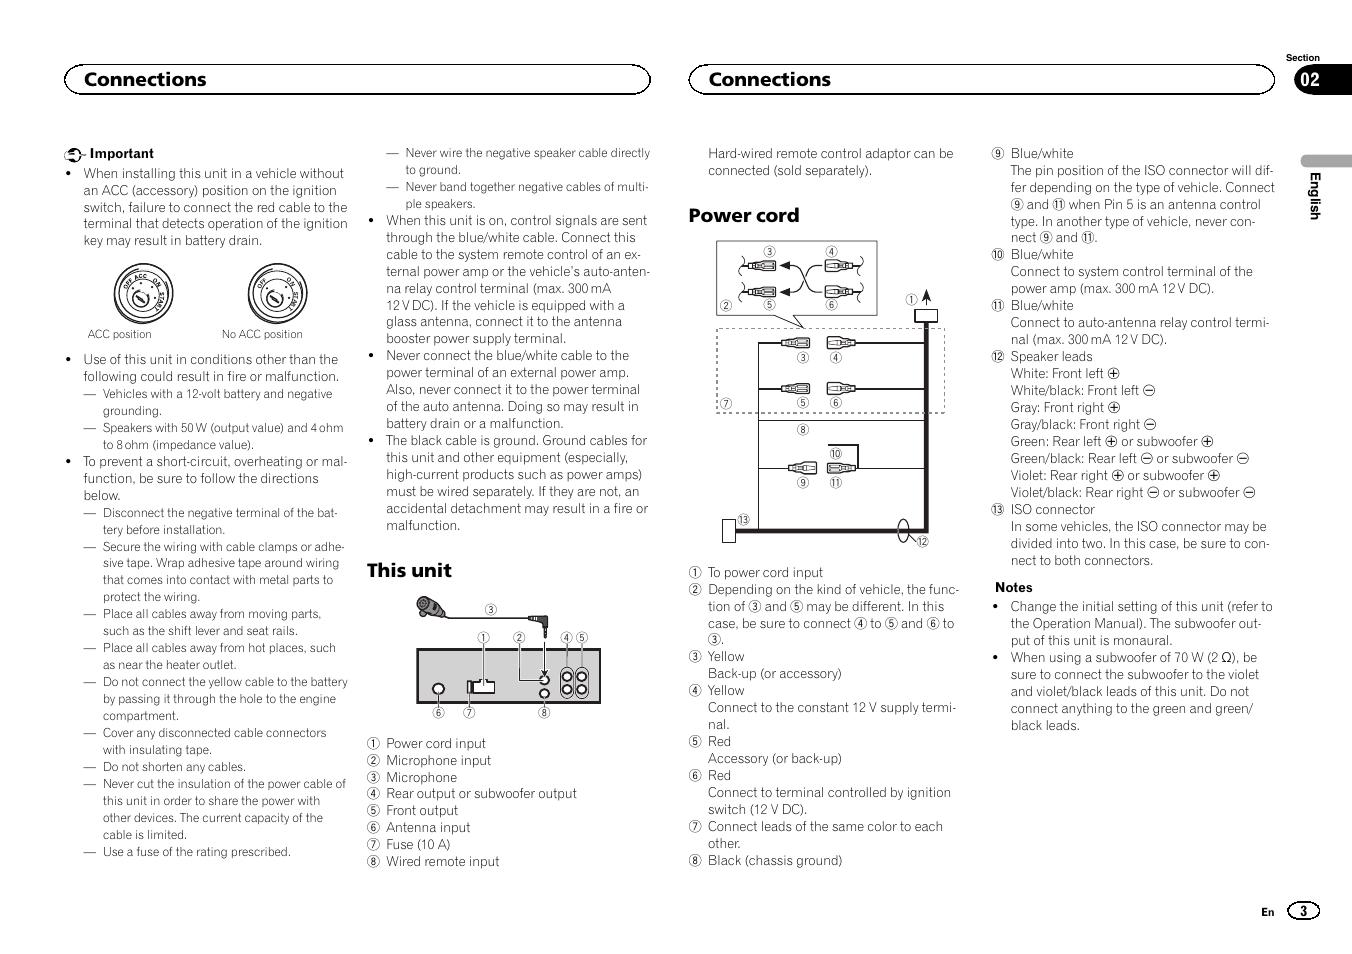 this unit power cord connections pioneer deh 4400bt user manual rh manualsdir com manual instrucciones pioneer deh 4400bt pioneer deh-4400bt installation manual